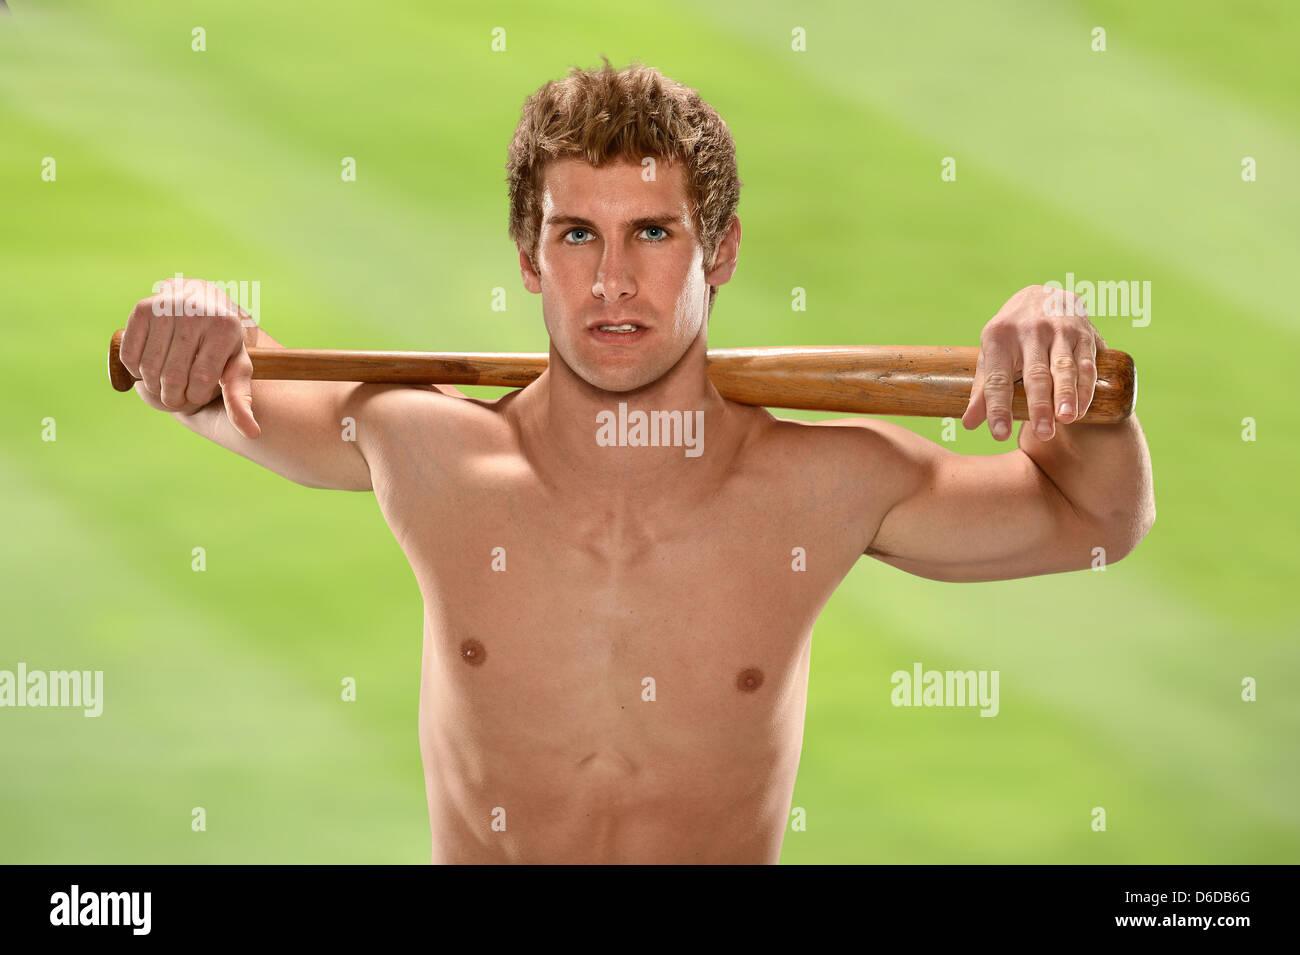 Shirtless man holding baseball bat outdoors - Stock Image